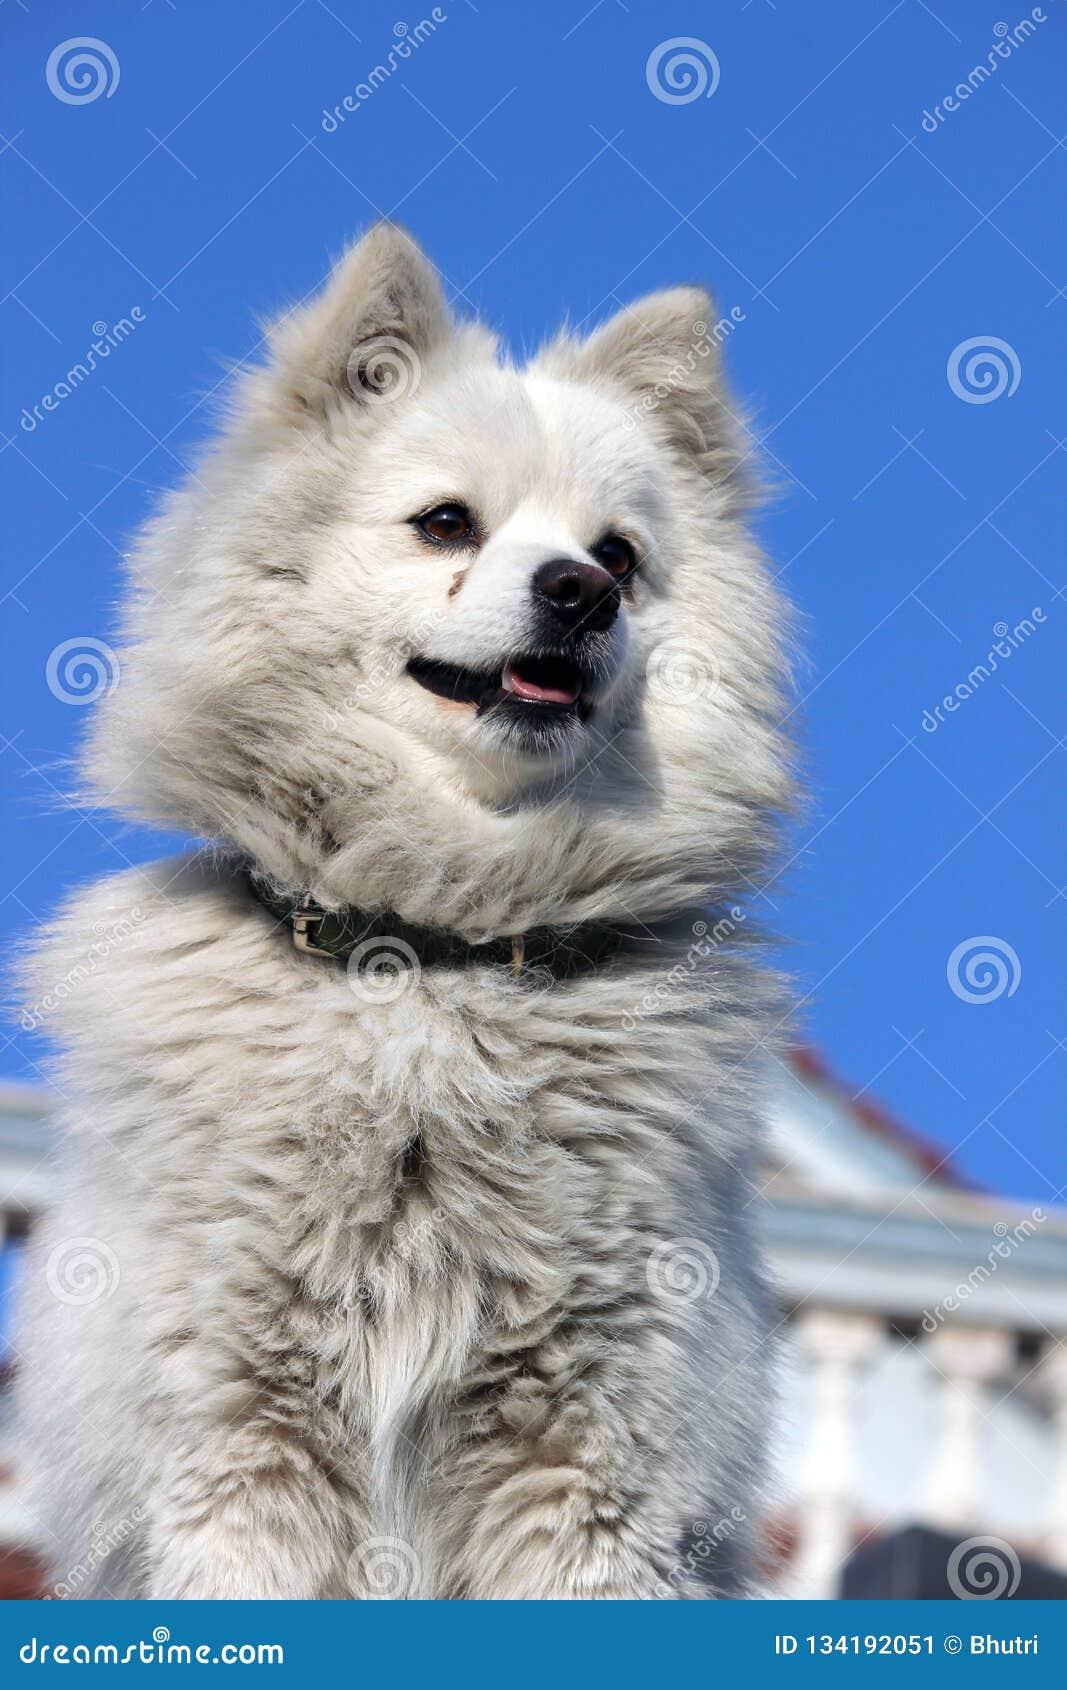 A white dog safe guarding a house.